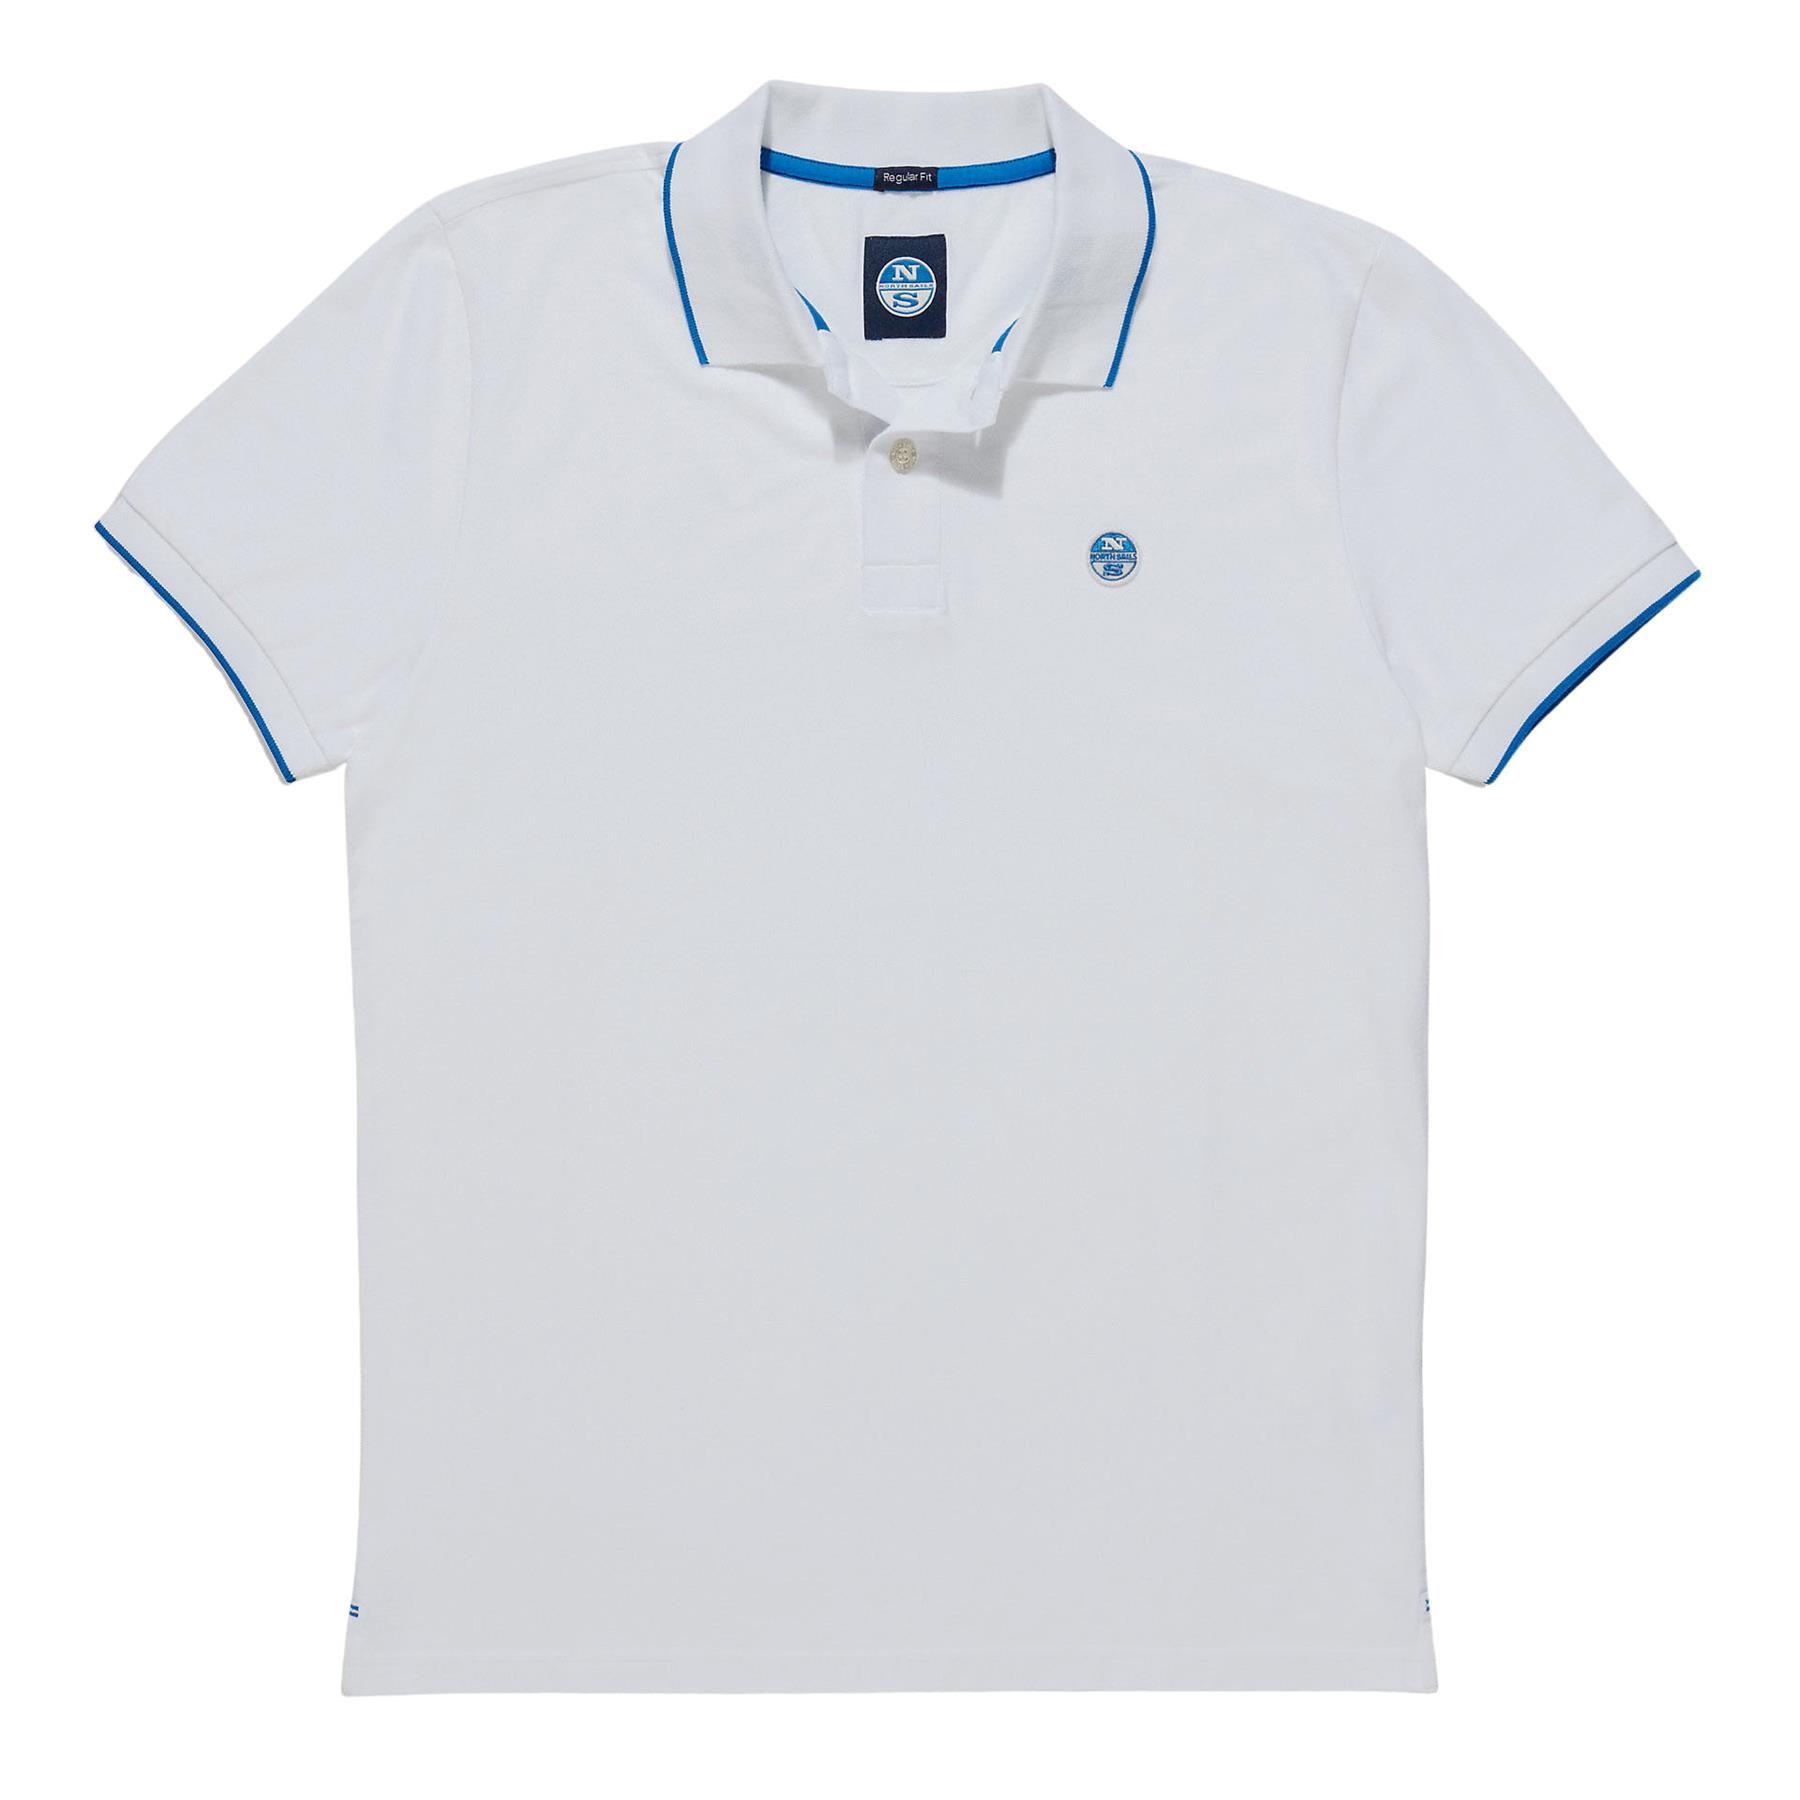 NORTH-SAILS-Mens-Legacy-Heritage-Short-Sleeve-Polo-Shirt-SALE-RRP-50 thumbnail 88